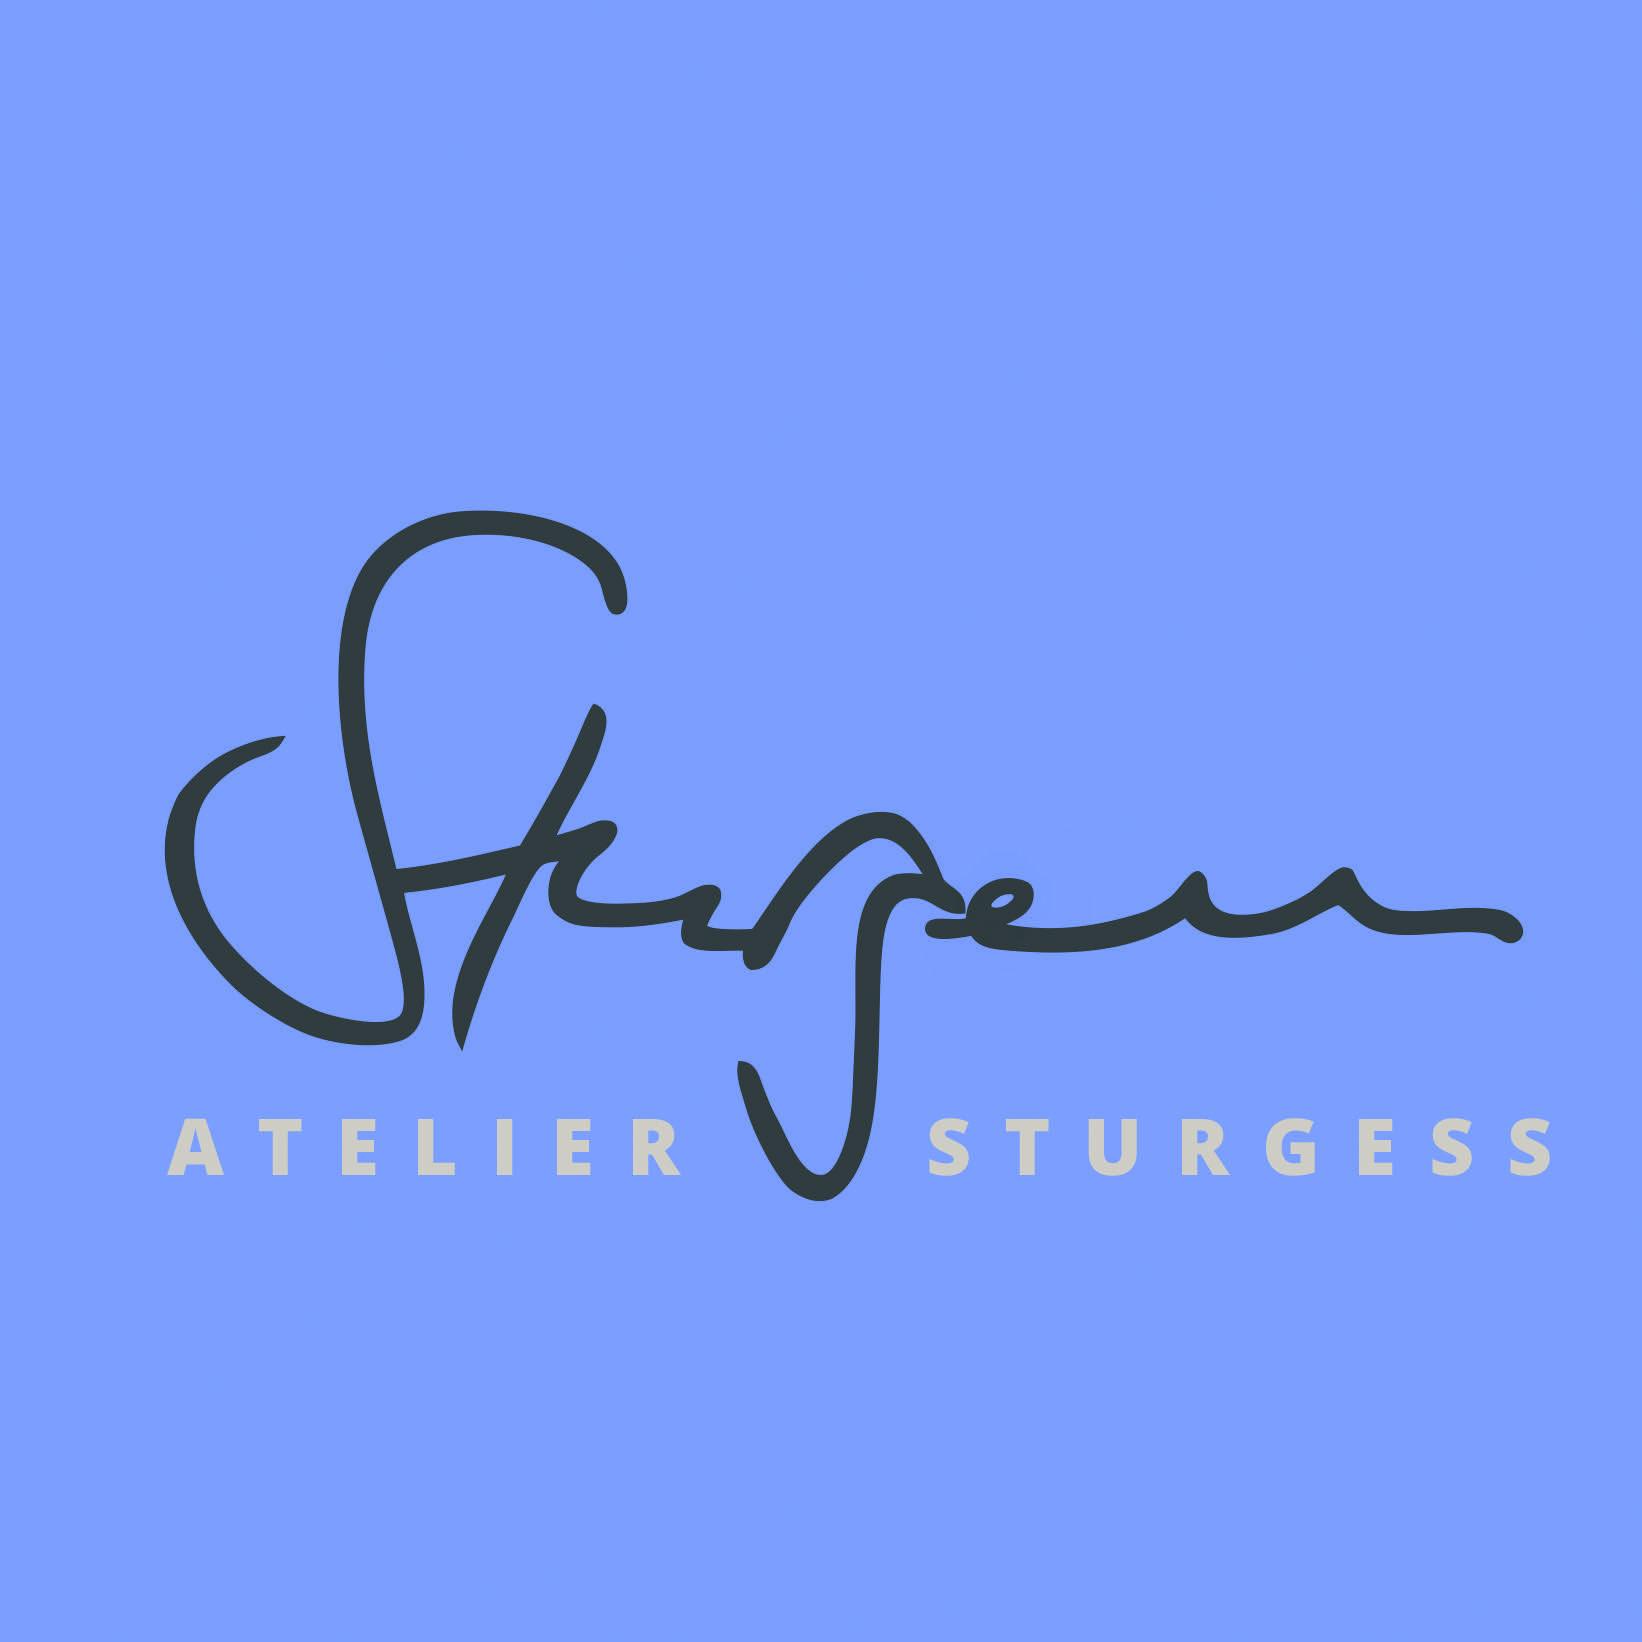 ATELIER STURGESS - STUDIO 33